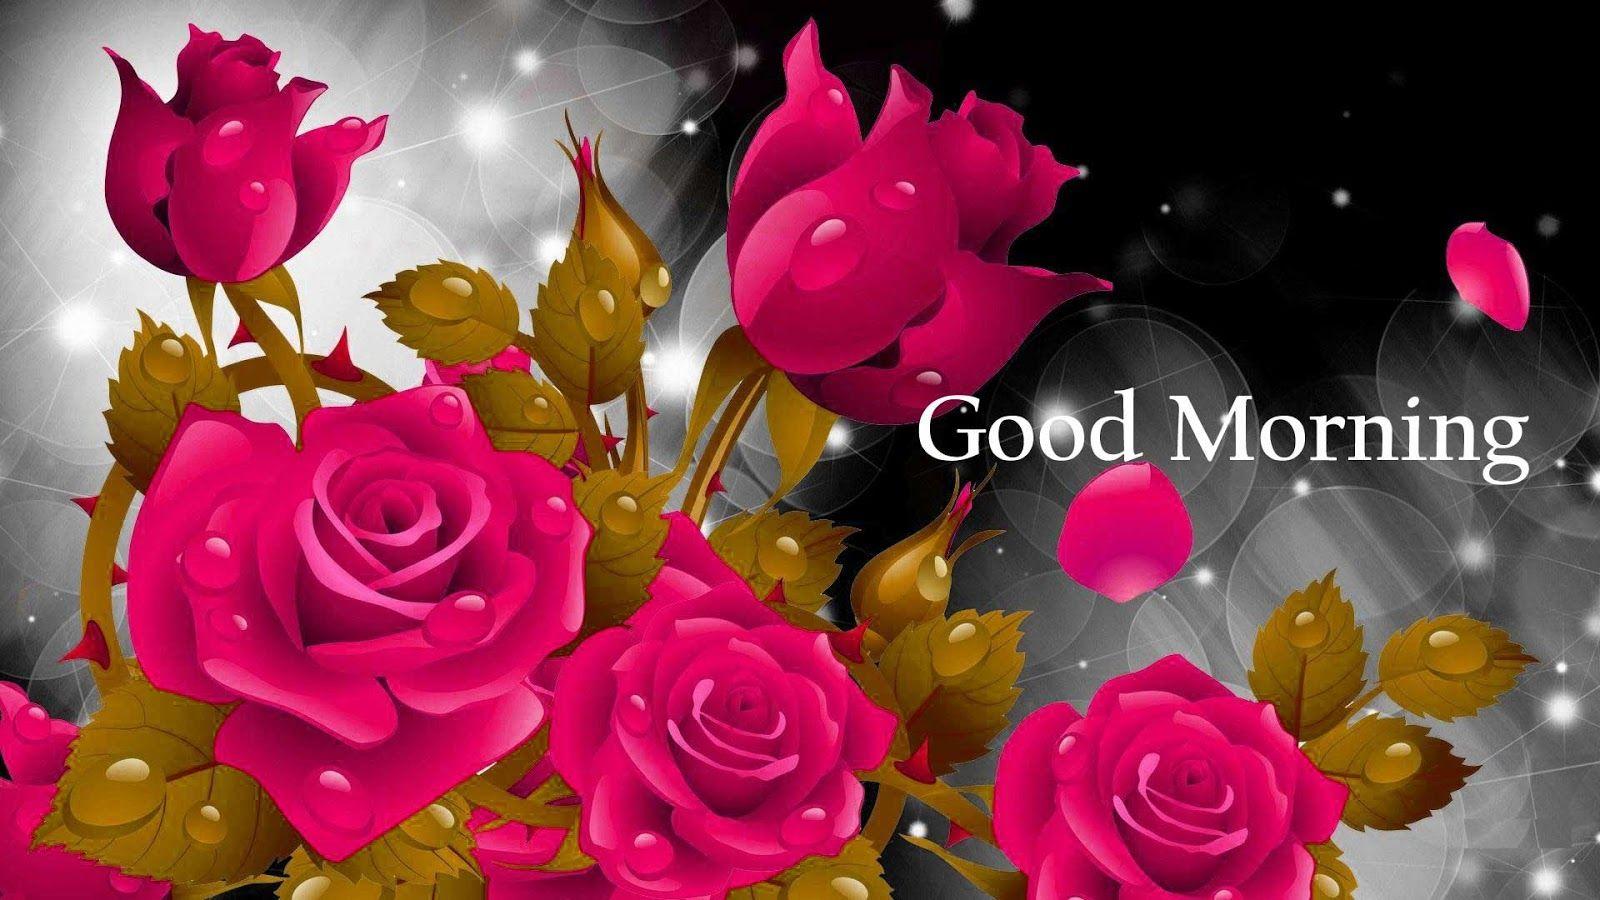 Permalink to Good Morning Flower Wallpaper